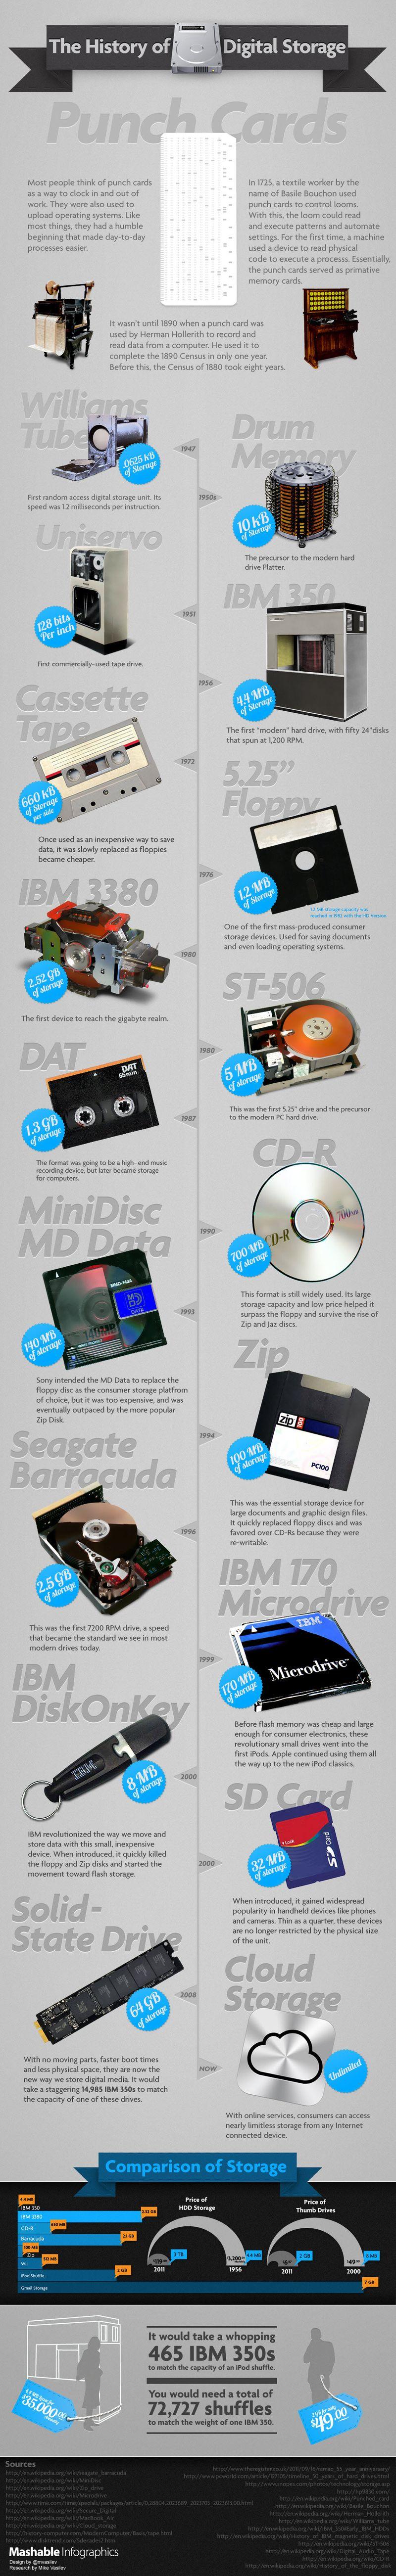 120108  history-of-digital-storage-infographic